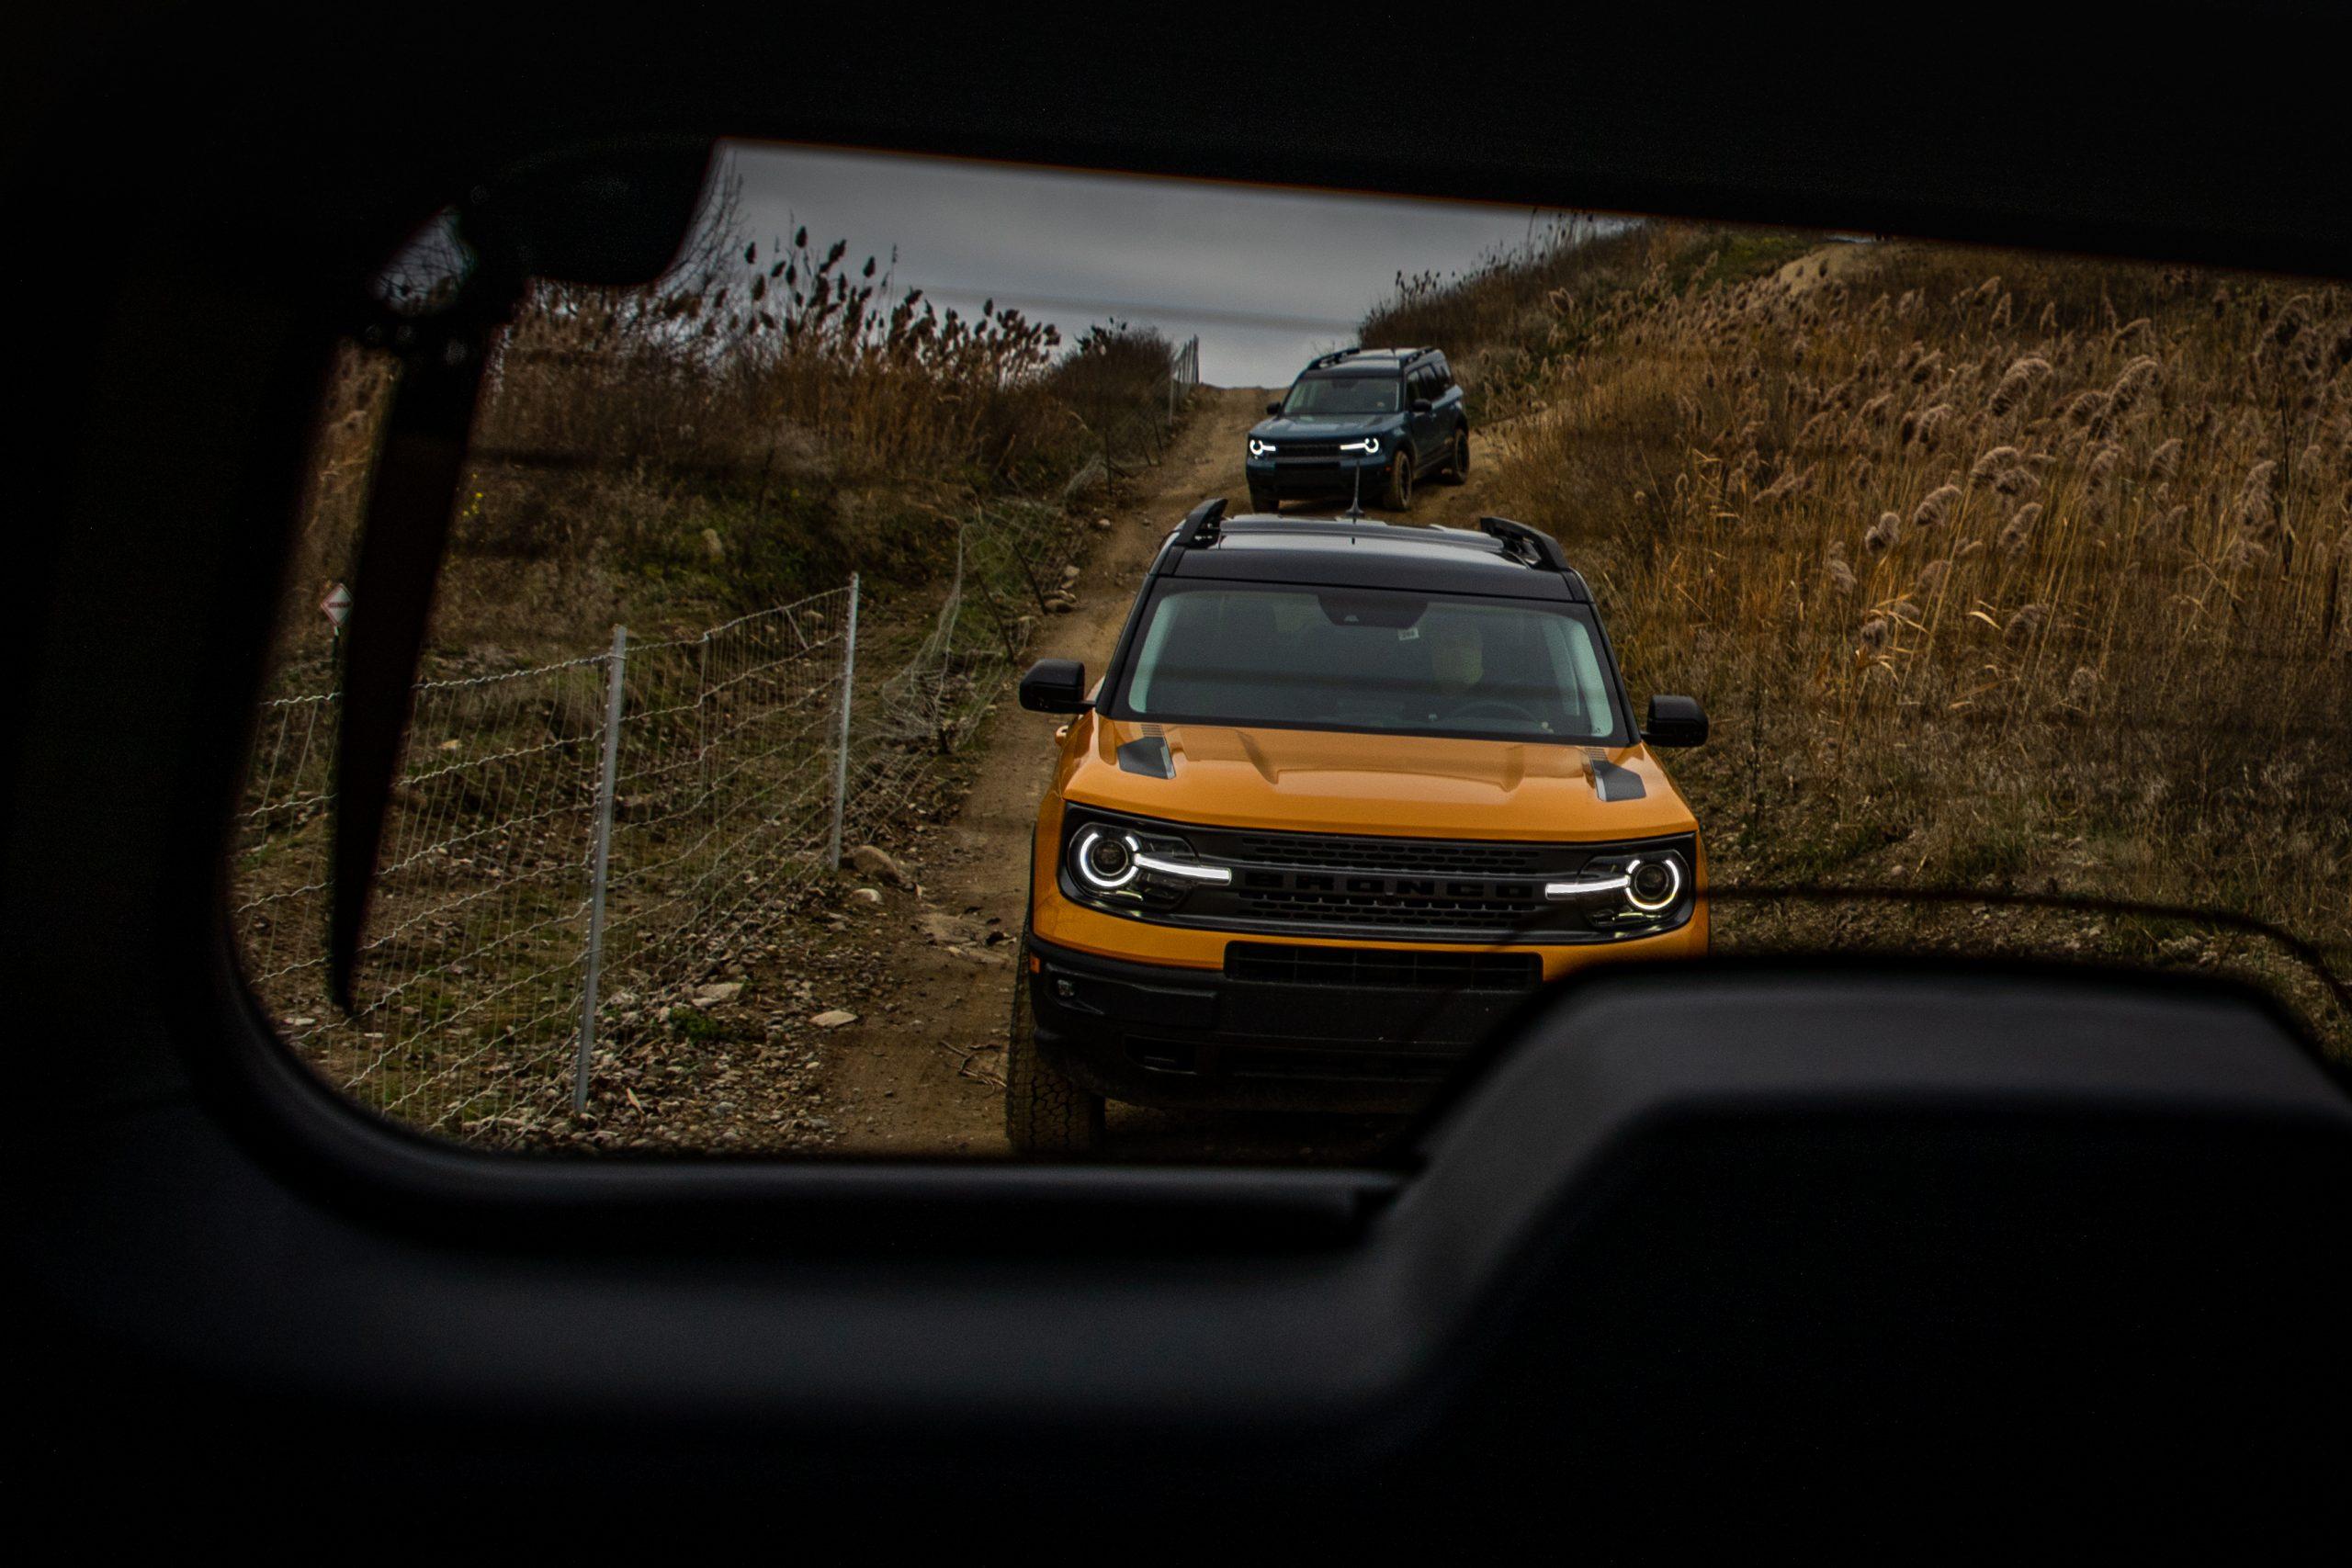 2021 Bronco Sport yellow through rear glass